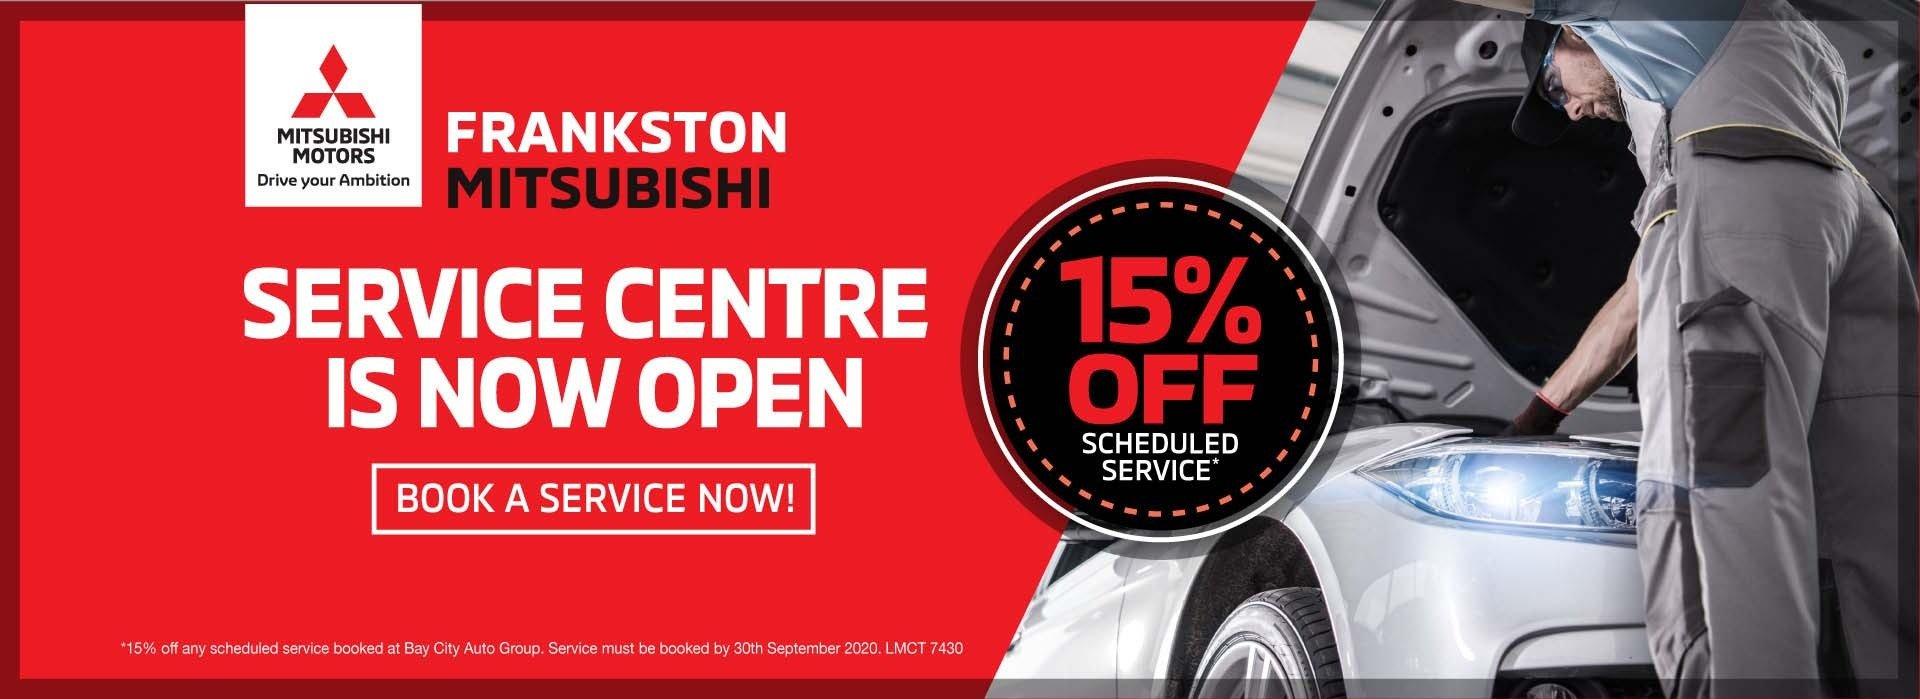 Frankston Mitsubishi - Service is open